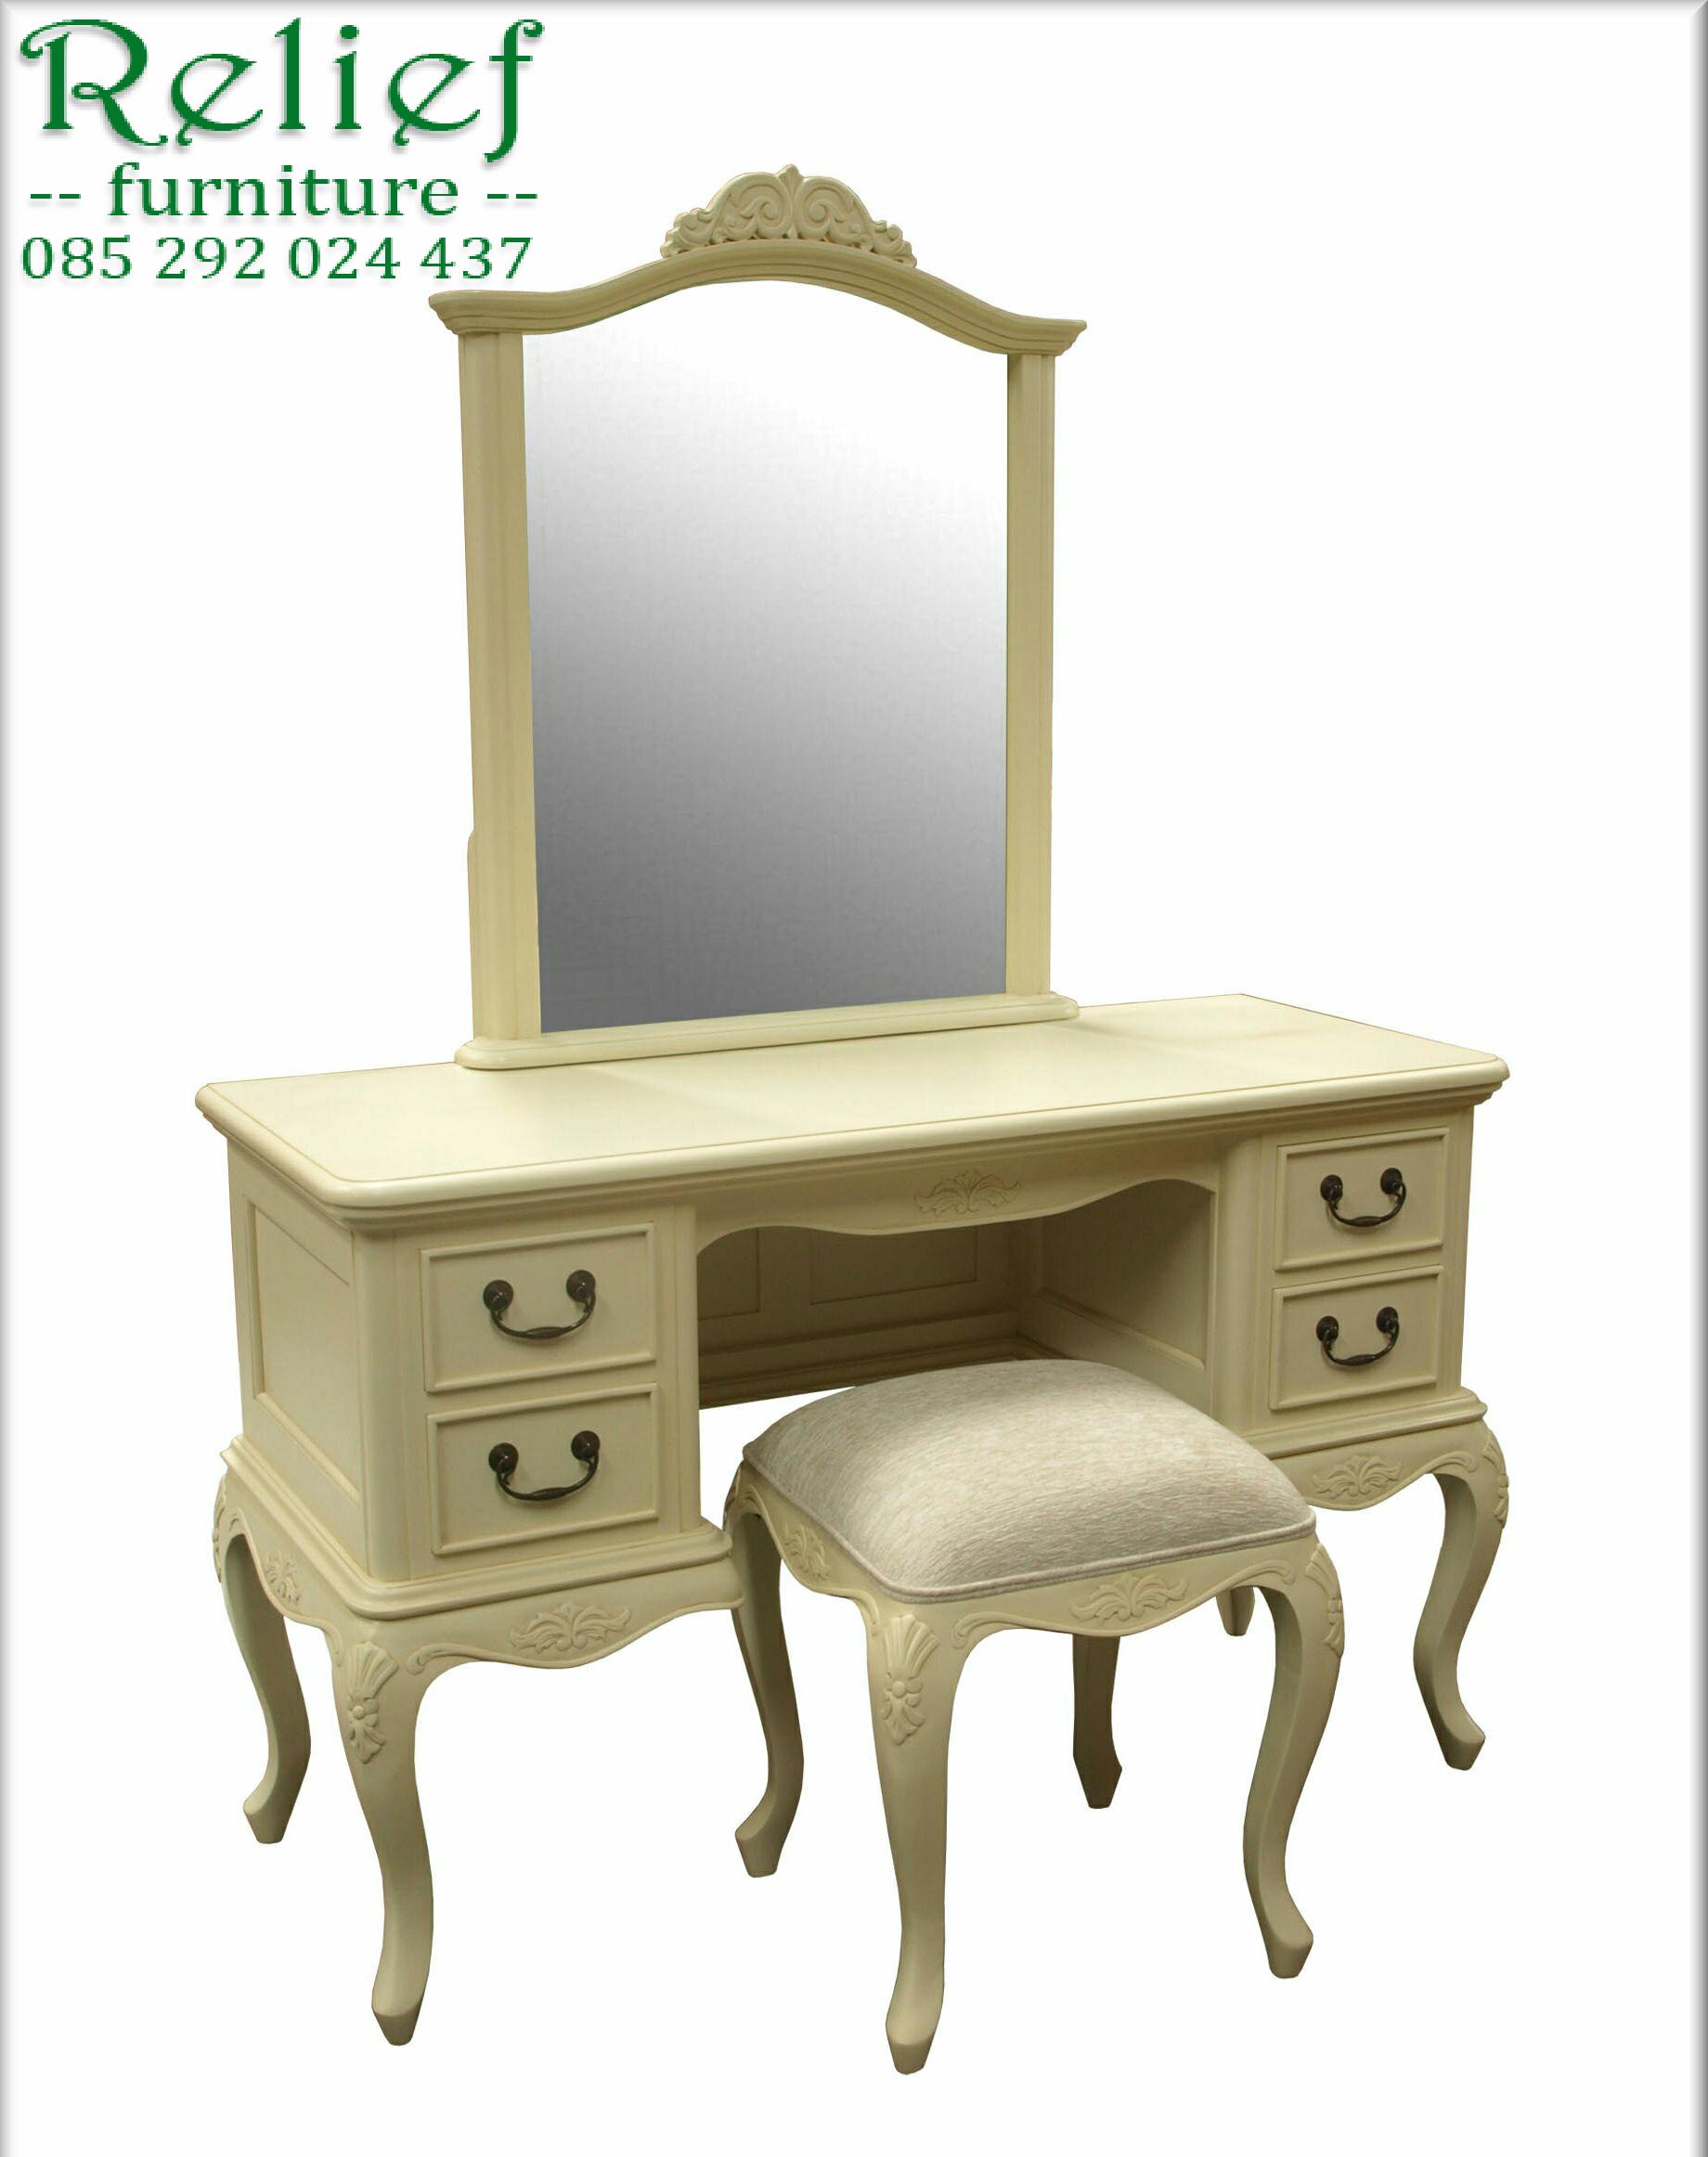 MEJA RIAS MINIMALIS MEWAH 6,Cermin hias mewah,cermin hias minimalis,cermin hias antic,cermin hias ukir,cermin hias modern,cermin hias terbaru,cermin hias besar,cermin hias kecil,cermin hias istimewa,cermin hias keluarga,cermin rias mewah,cermin rias minimalis,cermin rias ukir,cermin rias modern,cermin rias terbaru,cermin rias besar,cermin rias kecil,cermin rias istimewa,cermin rias istimewa,cermin rias eksport,meja konsule,meja console